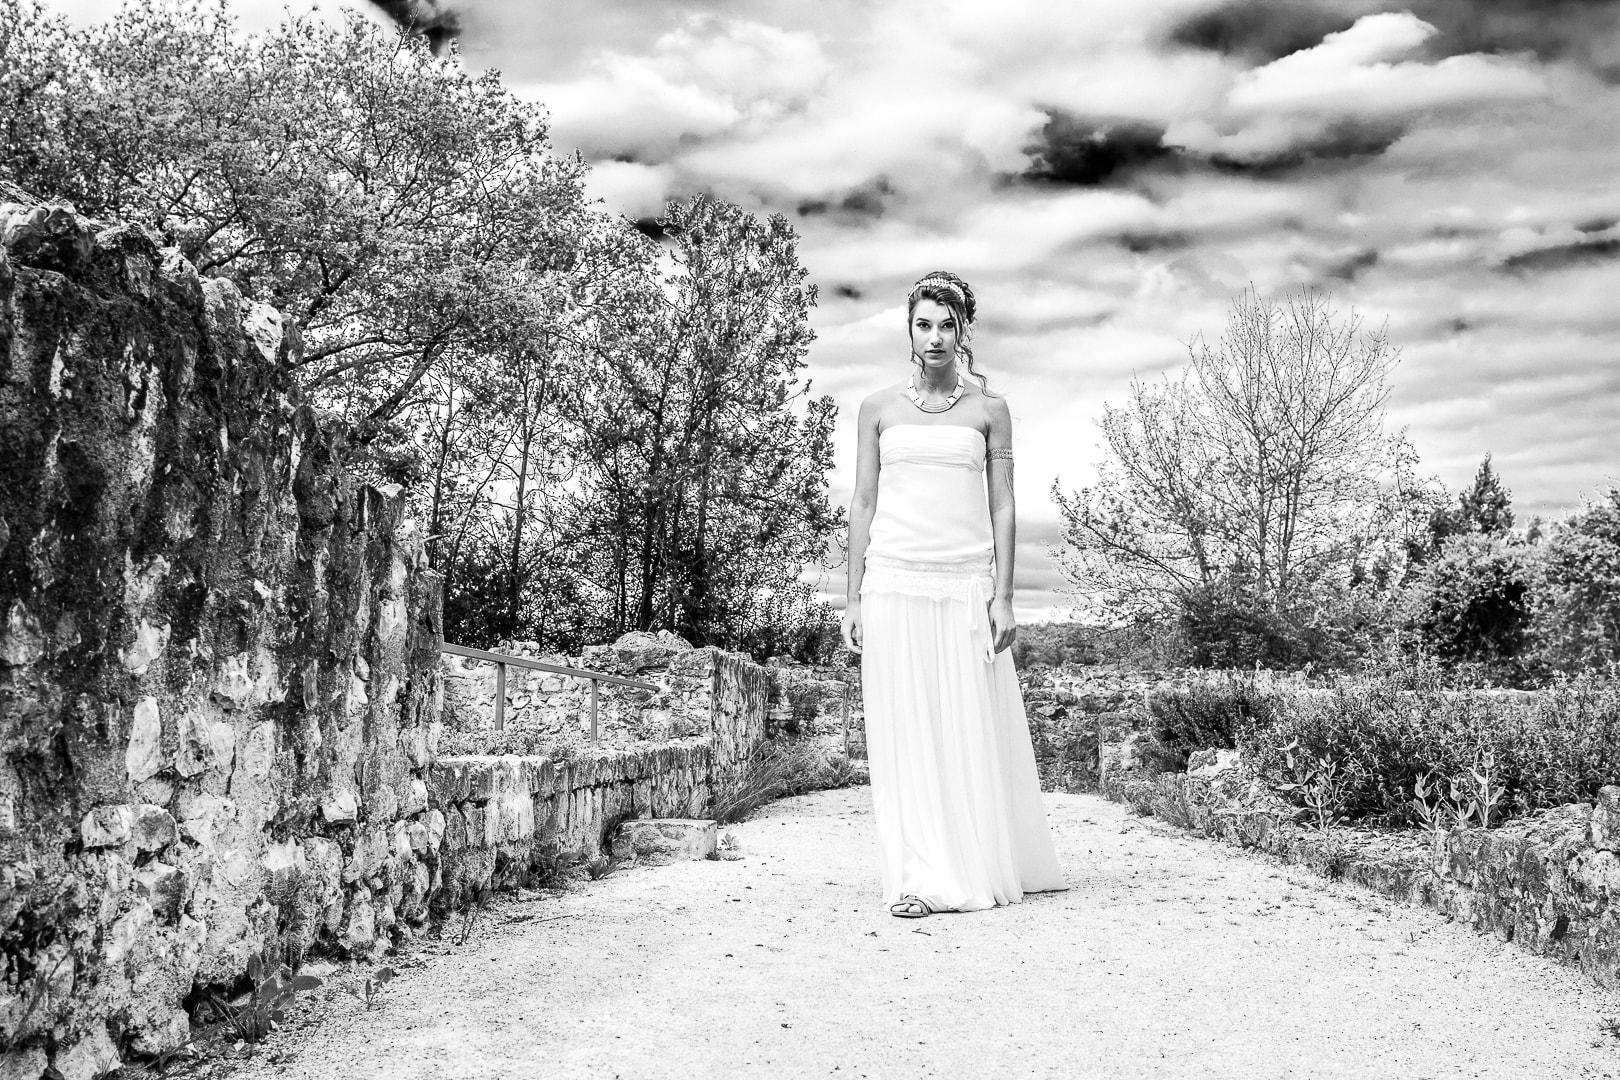 trezors-photography-photographe-professionnel-toulouse-31-mariage-wedding-inspiration-wedding-academy-sarah